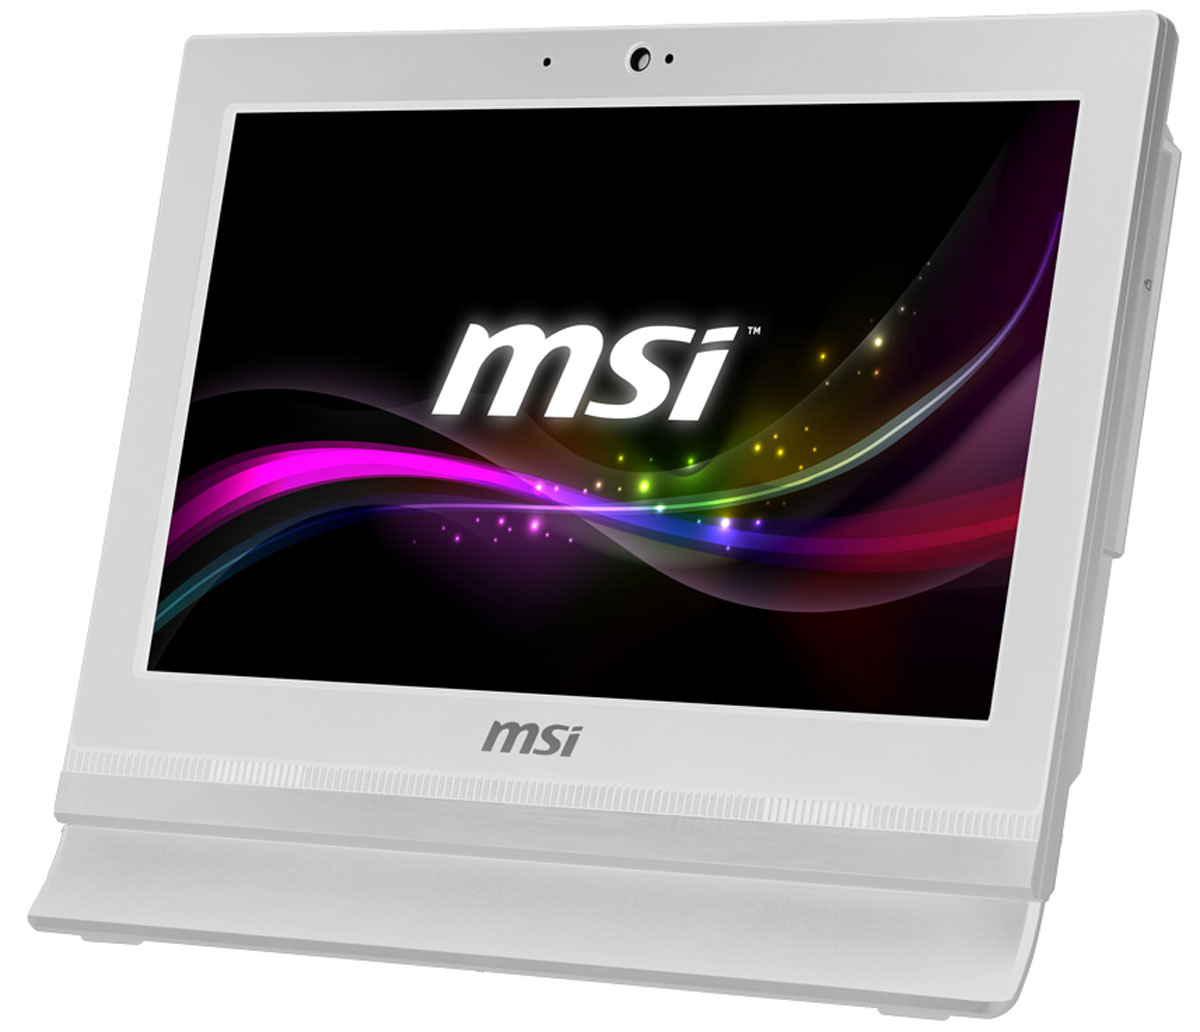 MSI Pro 16T 7M-010RU, White моноблок - Настольные компьютеры и моноблоки